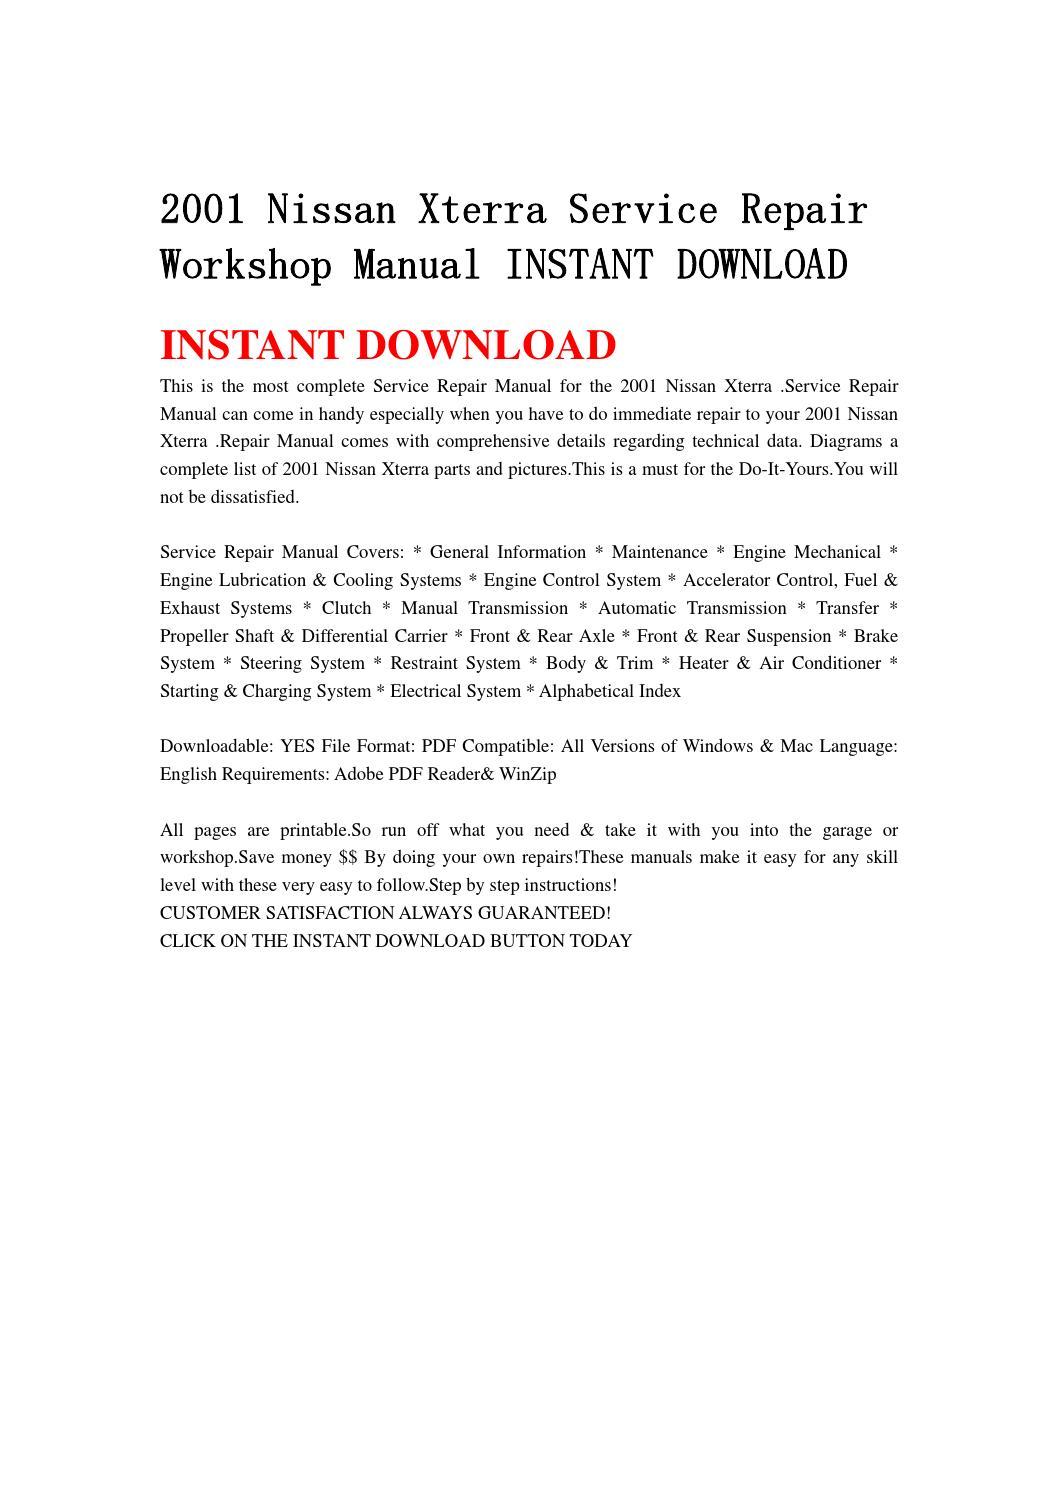 2001 nissan xterra service repair workshop manual instant download by  kmsjefhn - issuu